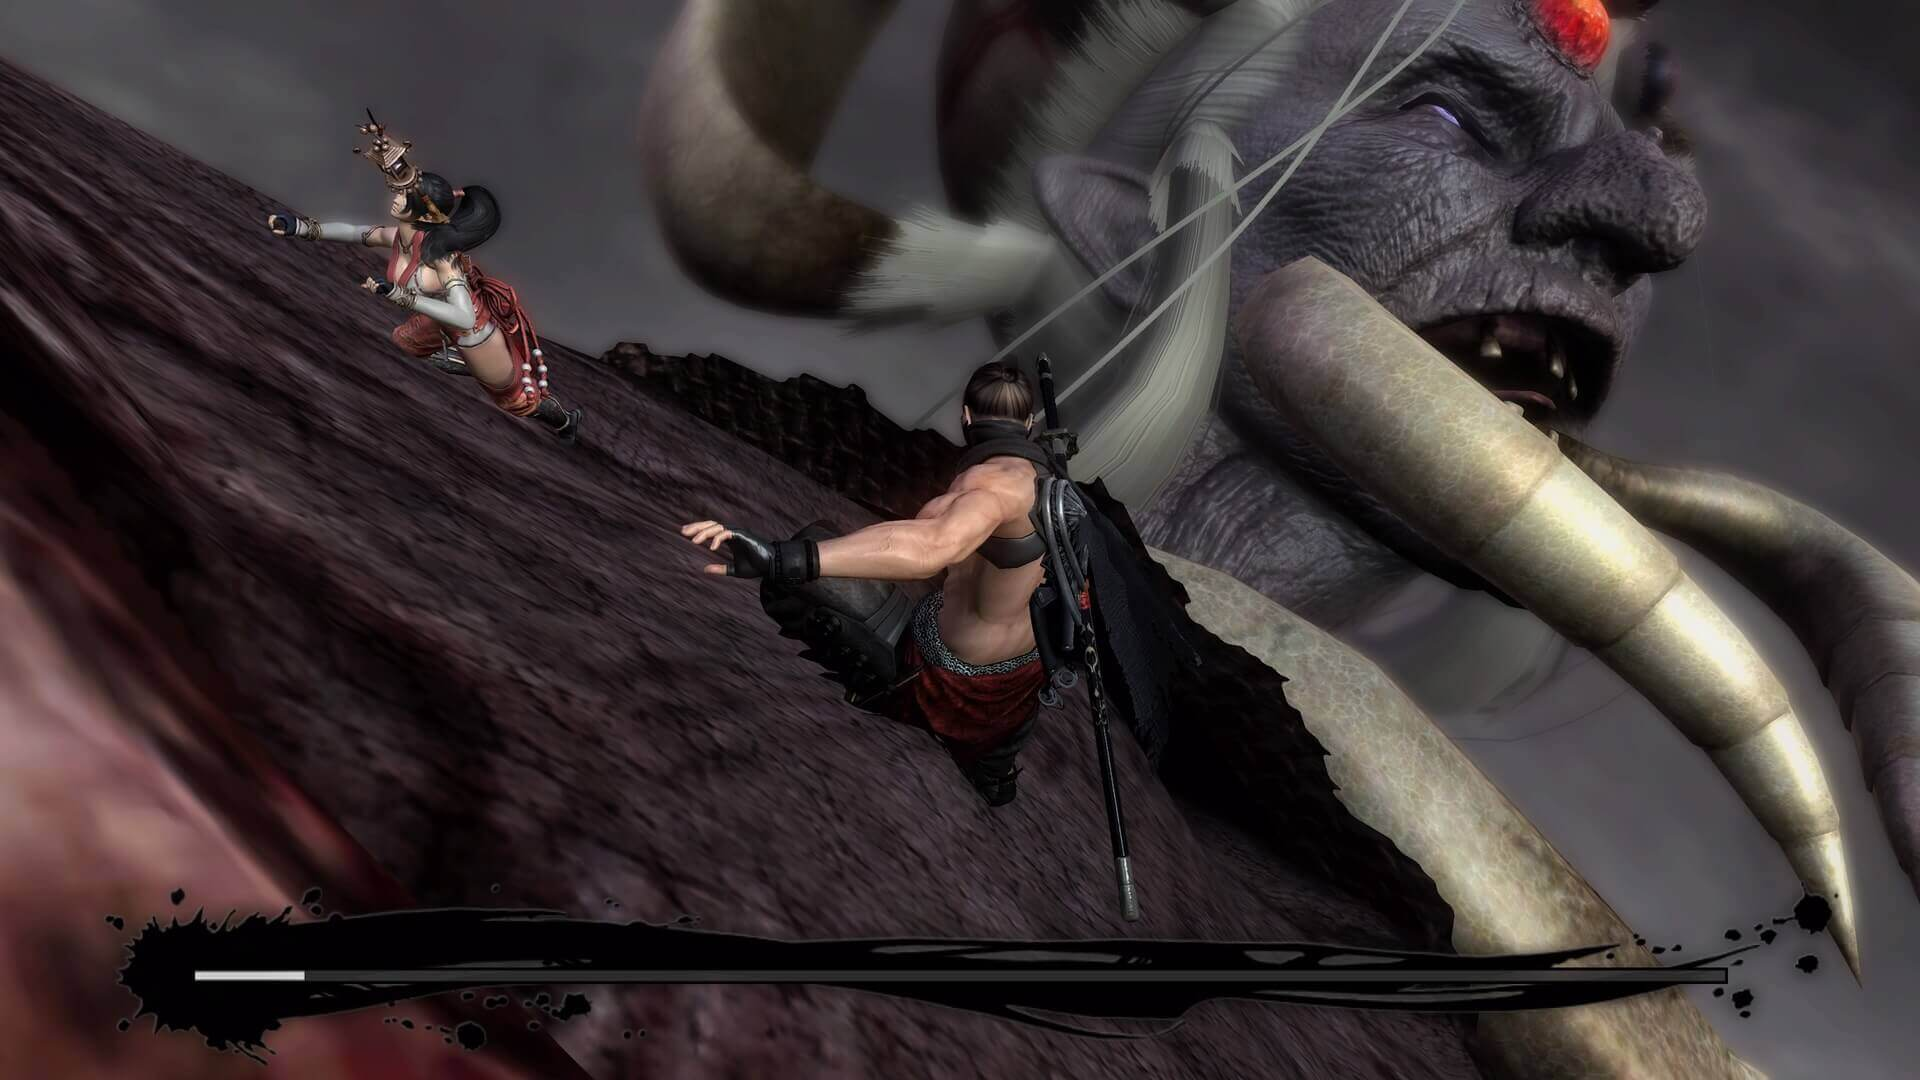 Ninja Gaiden 3 Razor's Edge, Ninja Gaiden, Cabeça Fria, Delfos, Koei Tecmo, Team Ninja